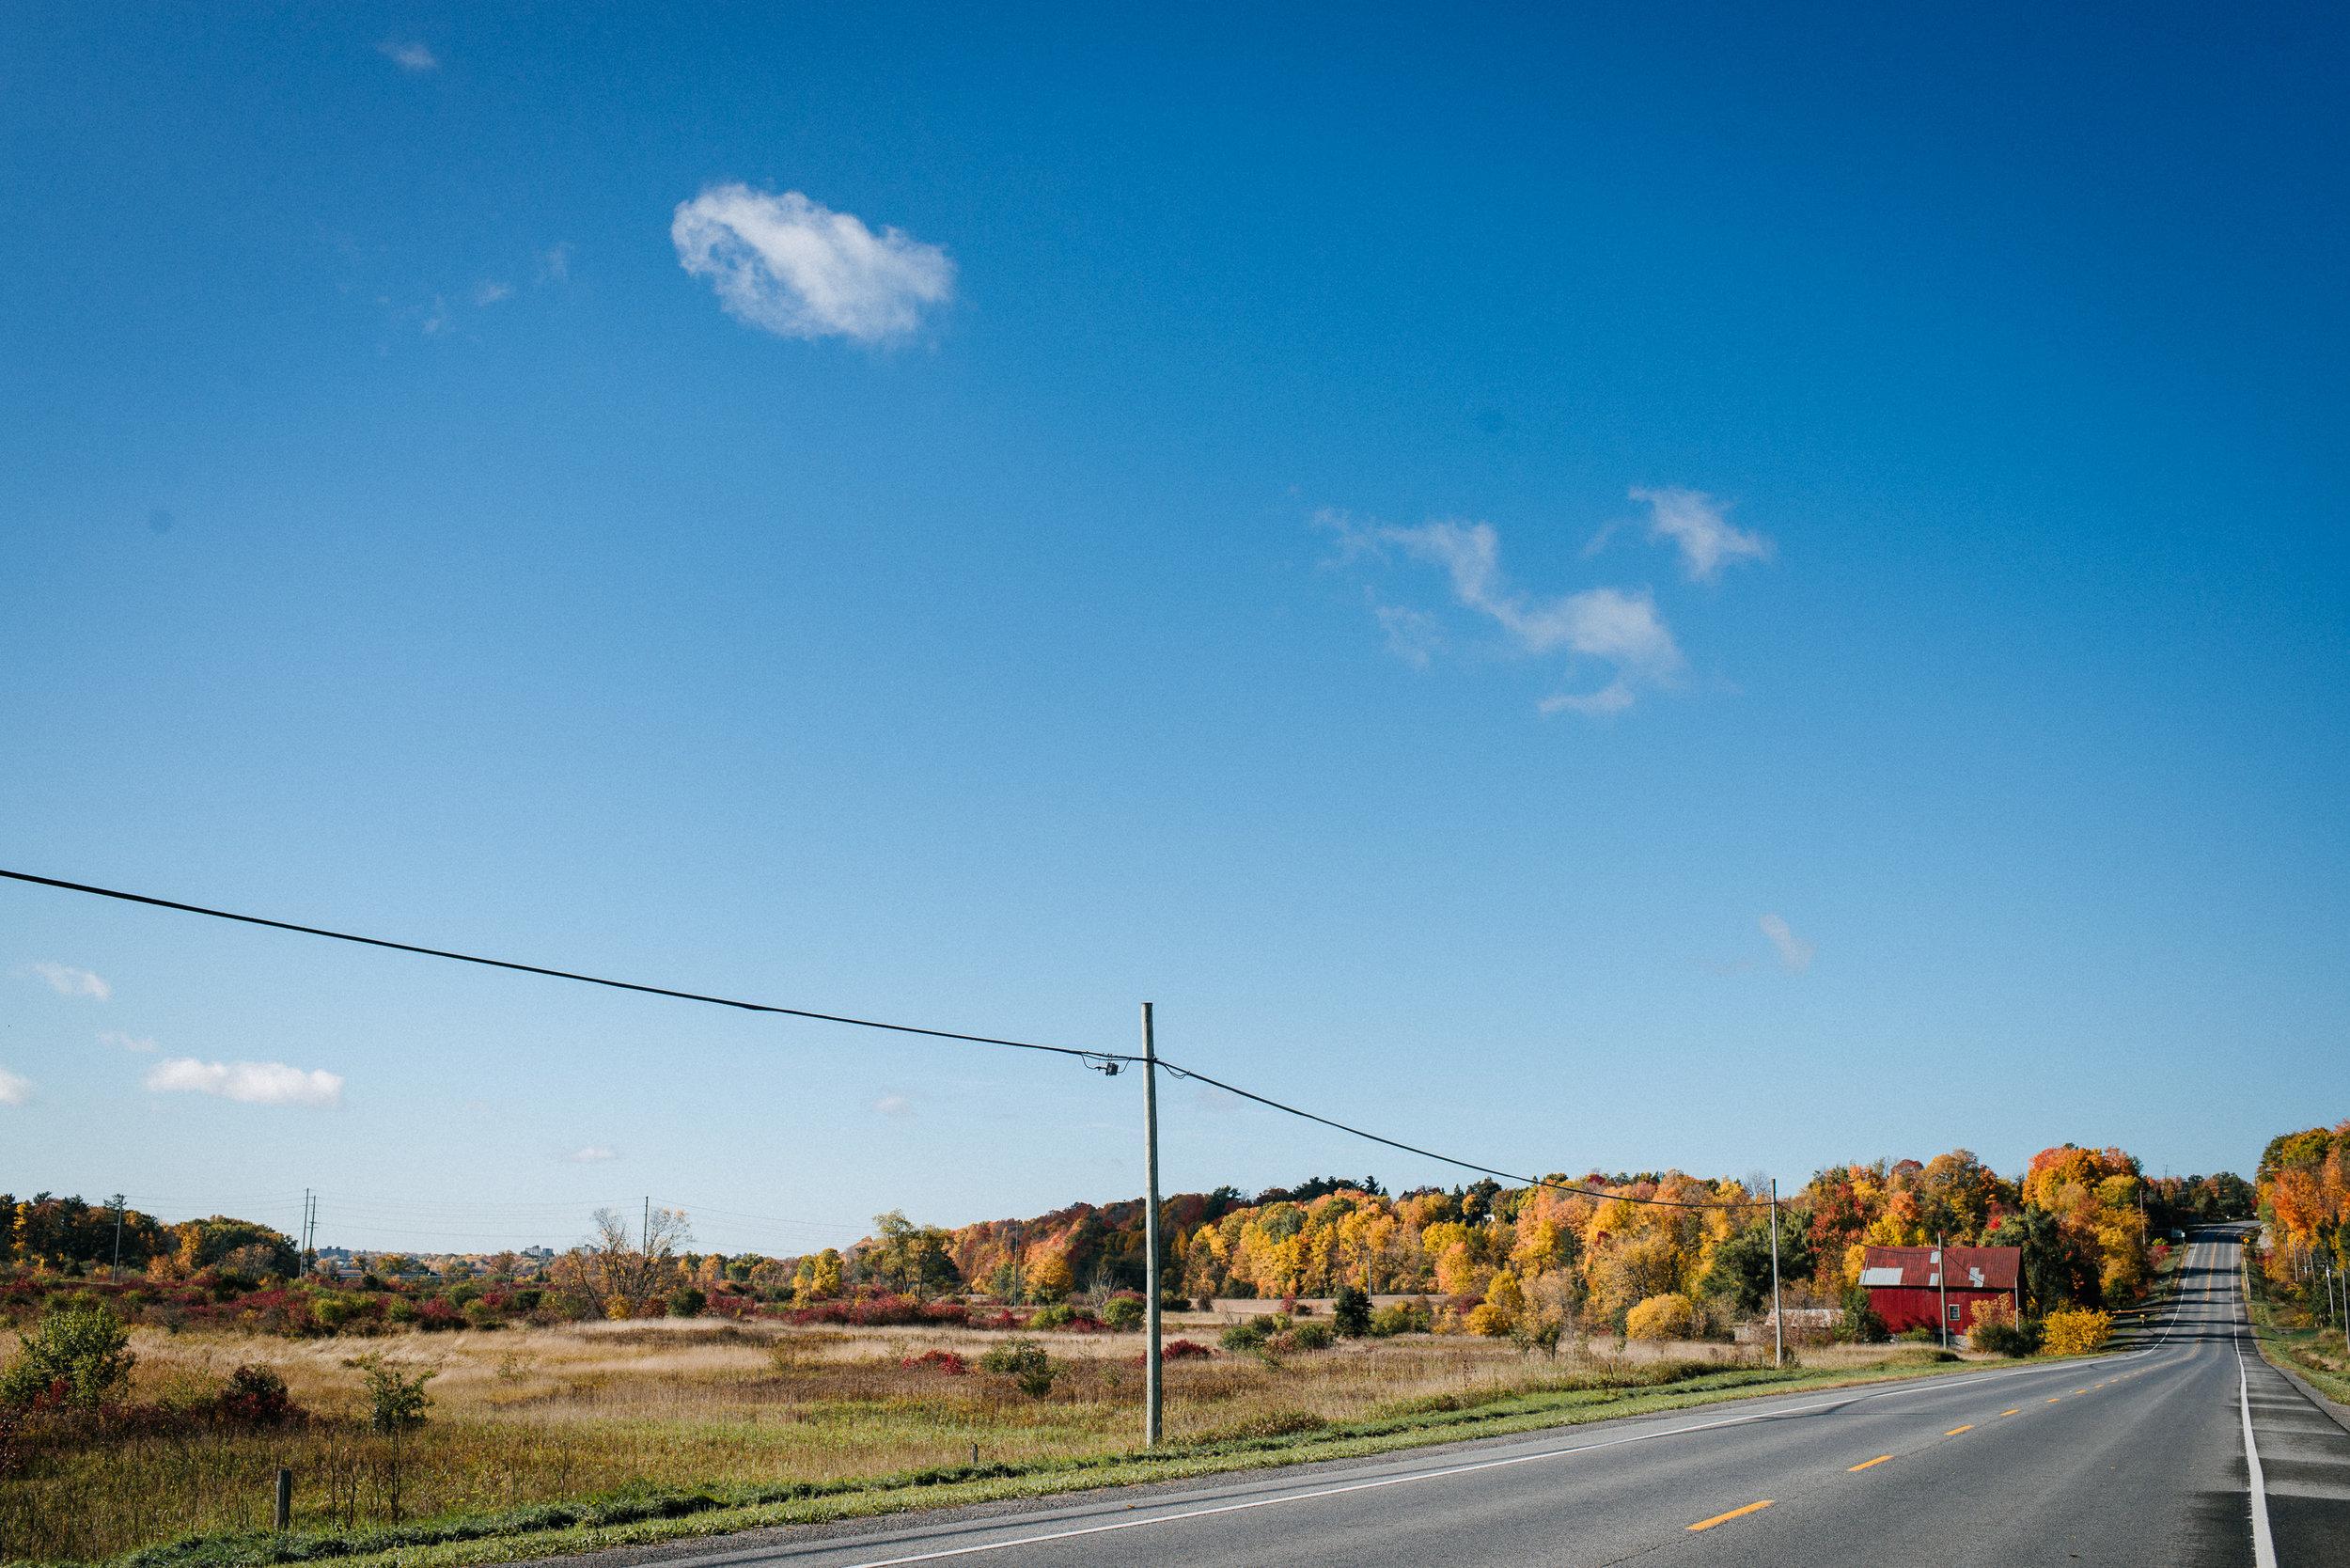 autumn dorumentary photography viara mileva-102825vm.jpg